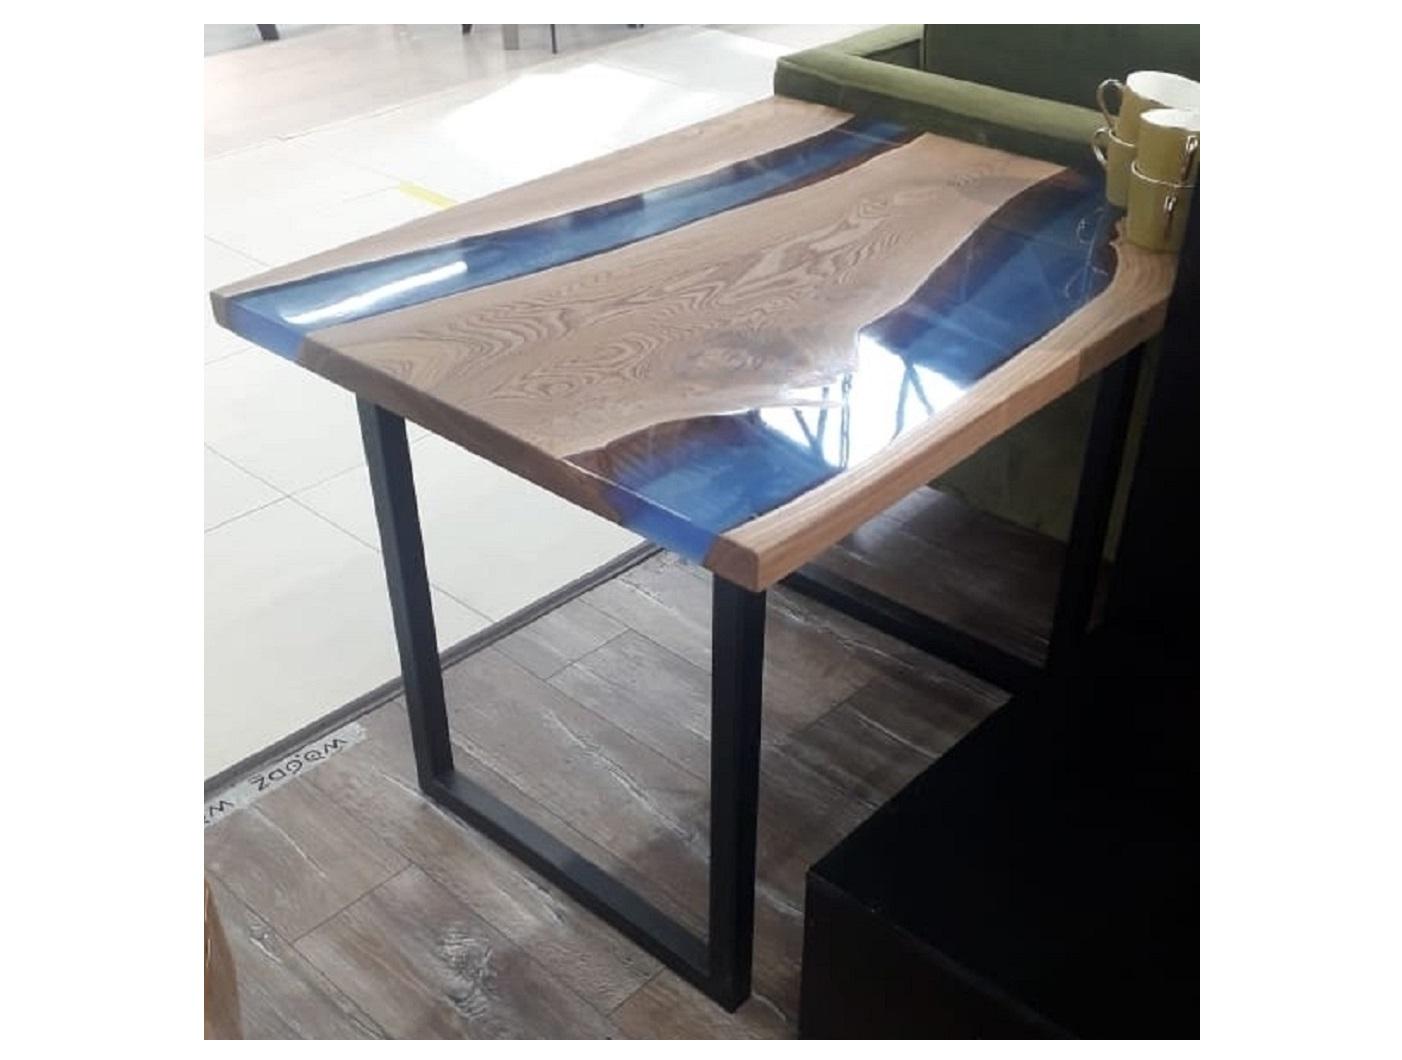 Обеденный стол (woodzpro) коричневый 80x75x100 см.